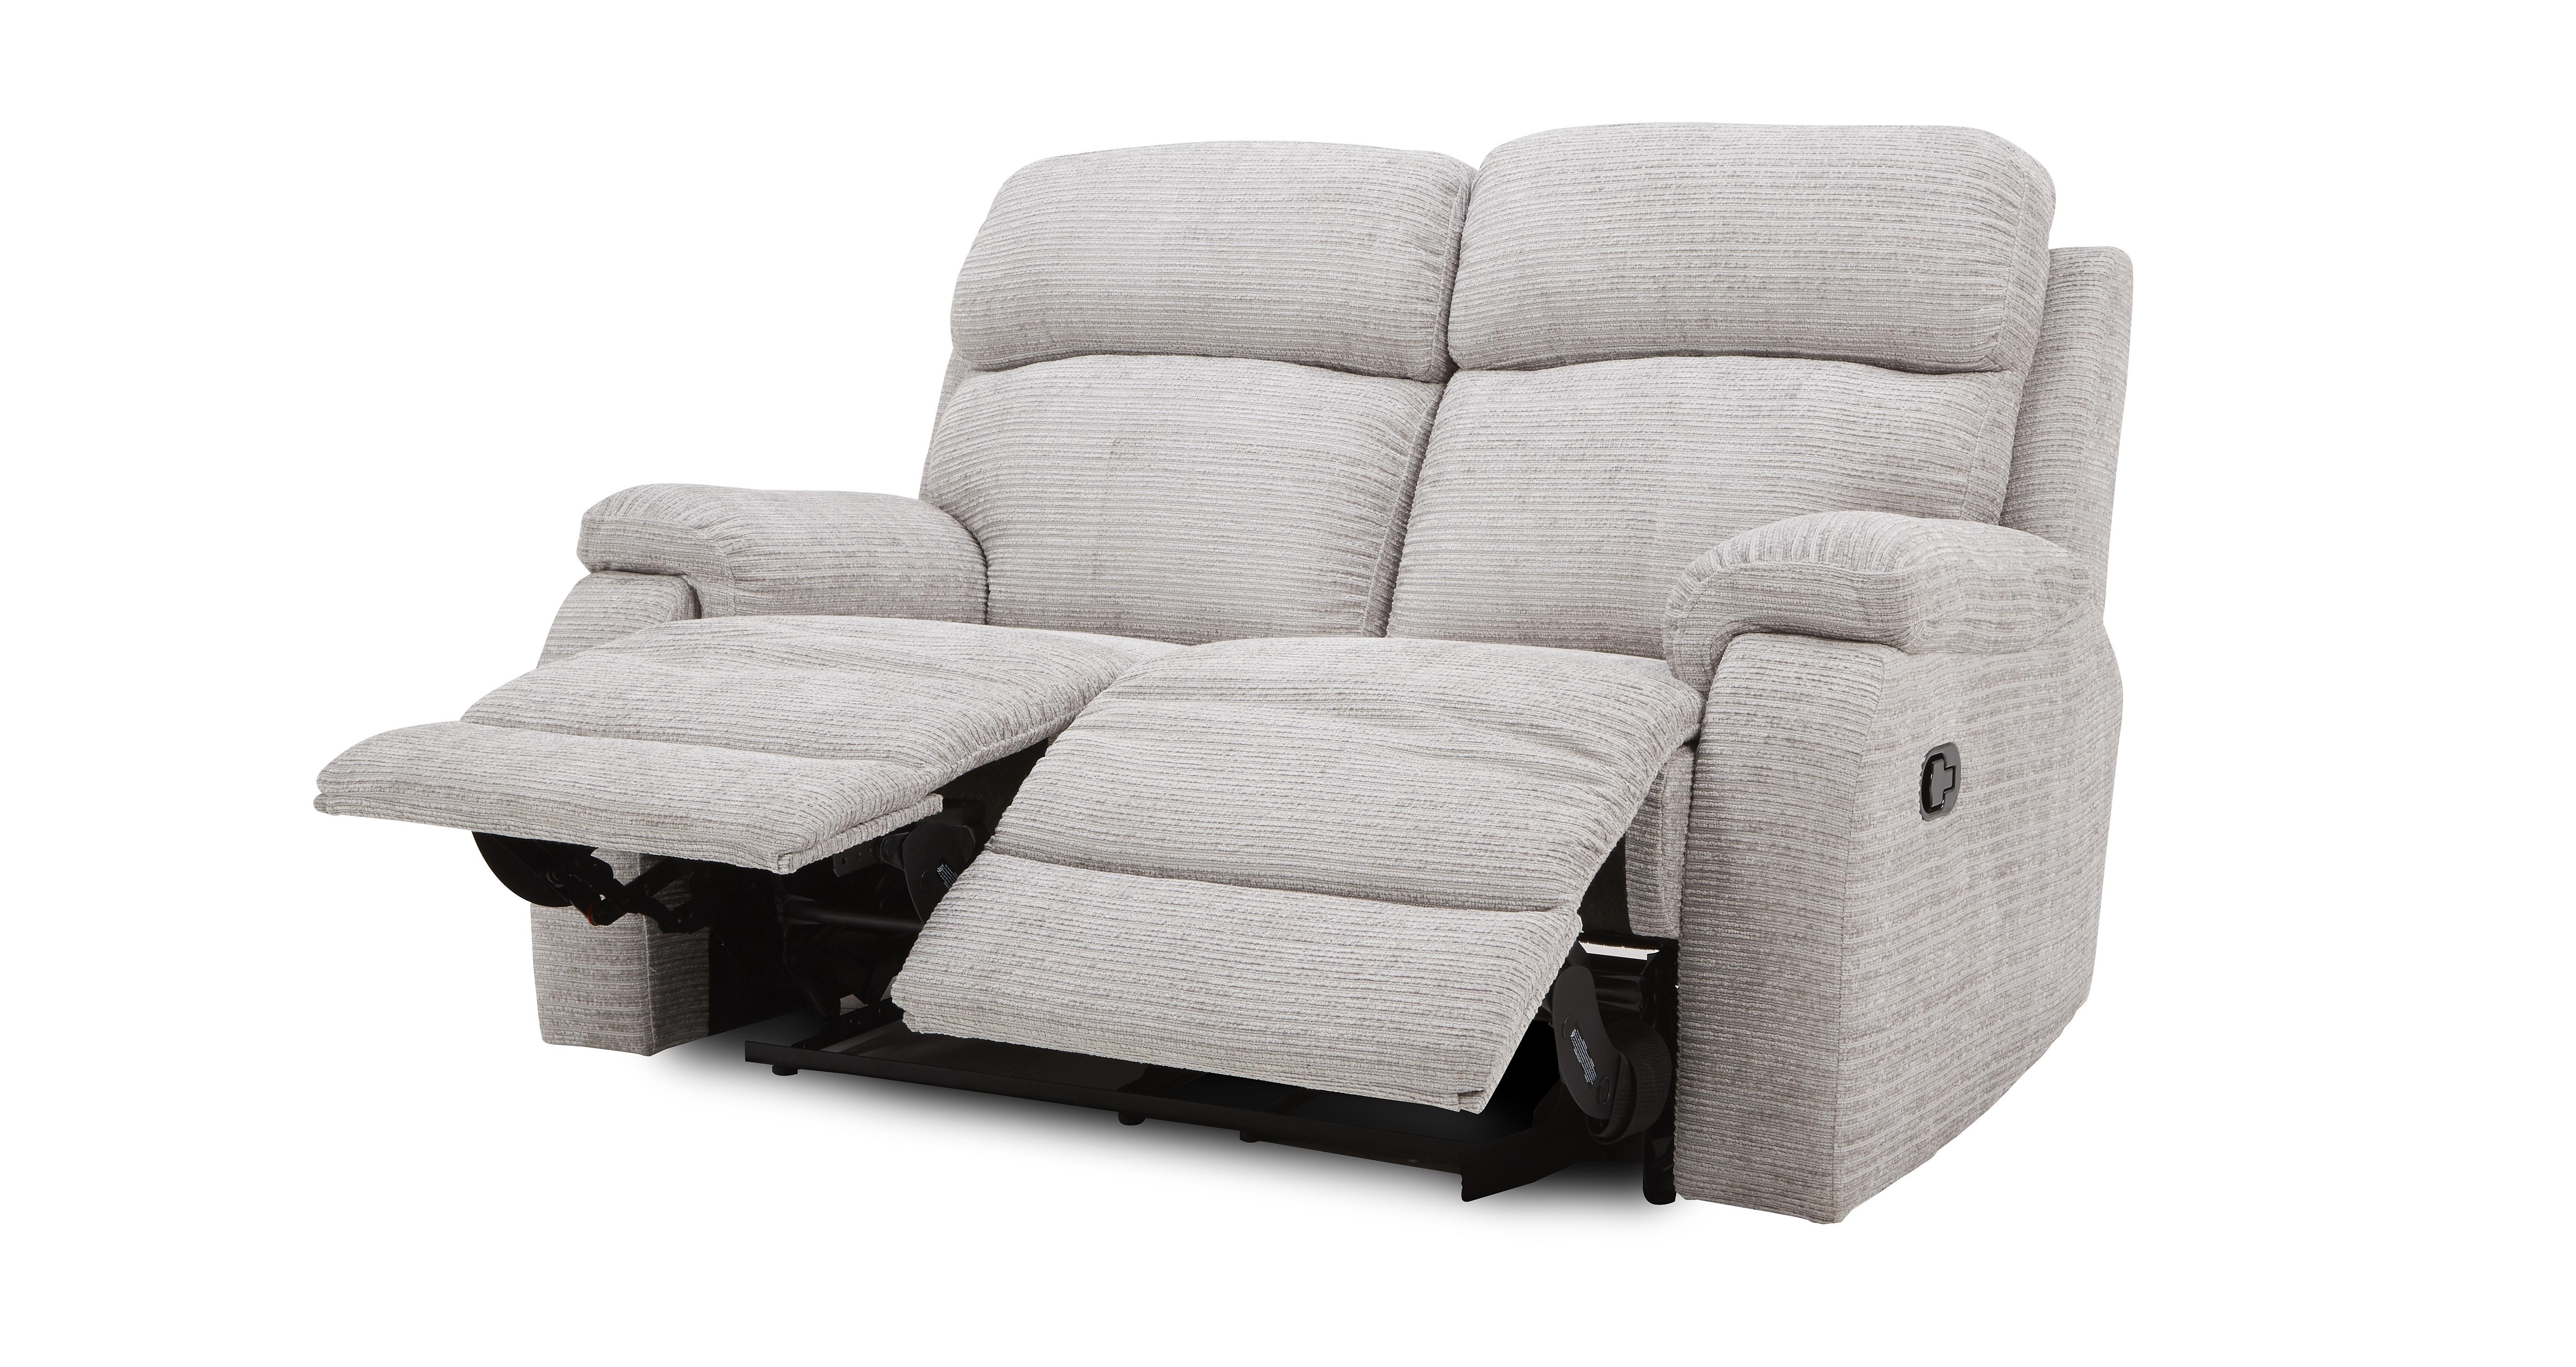 home theater sofas uk modern sofa sleepers newbury 2 seater manual recliner prestige dfs ireland